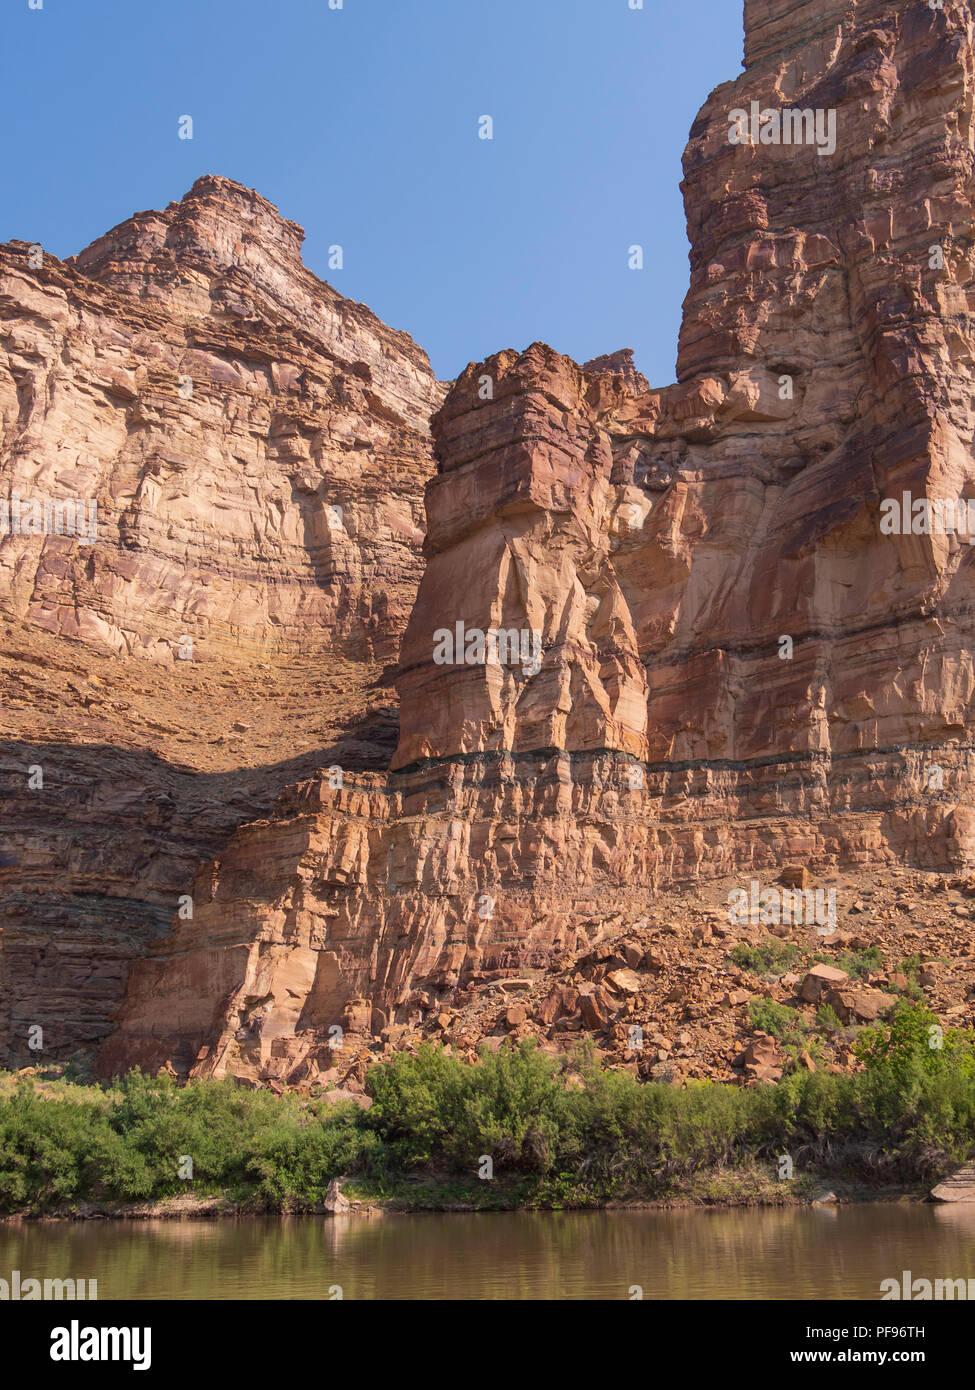 Cliffs along the river, upper Desolation Canyon north of Green River, Utah. - Stock Image